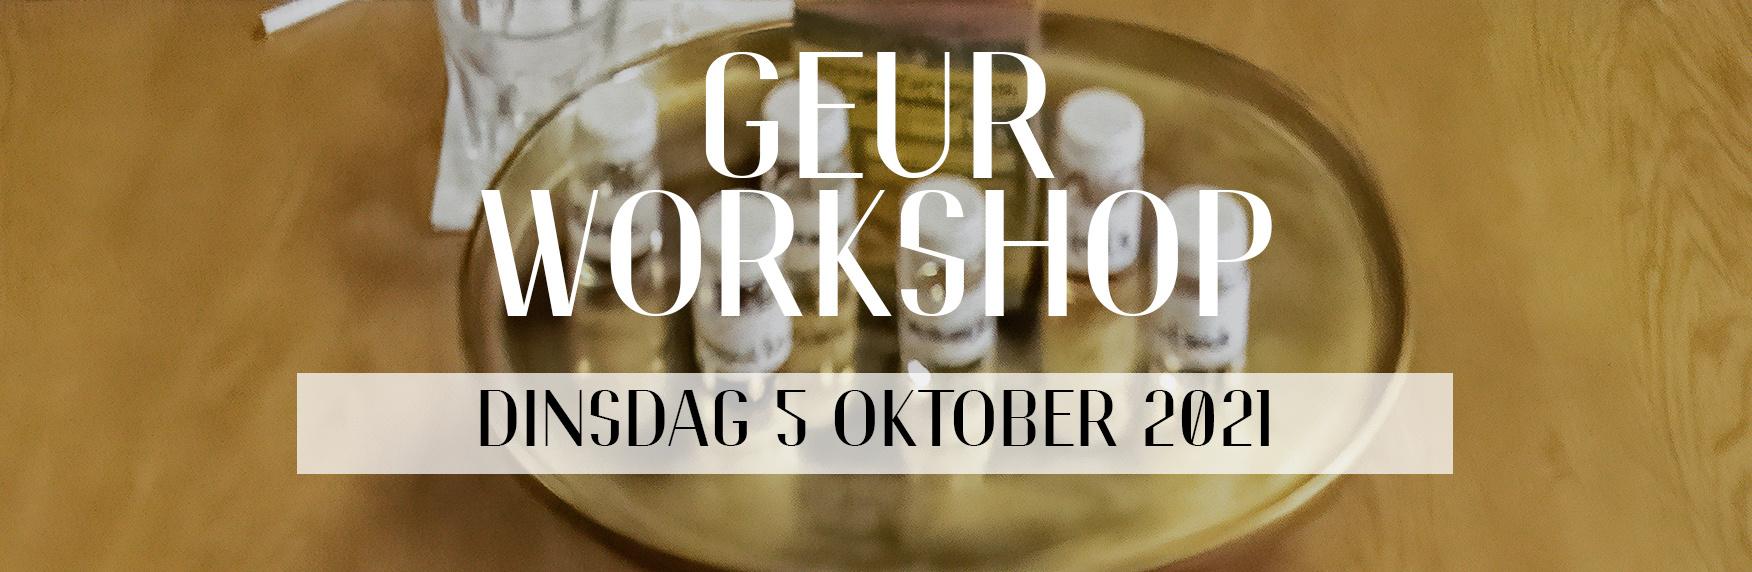 Geur workshop: Parfum [5 oktober 2021]